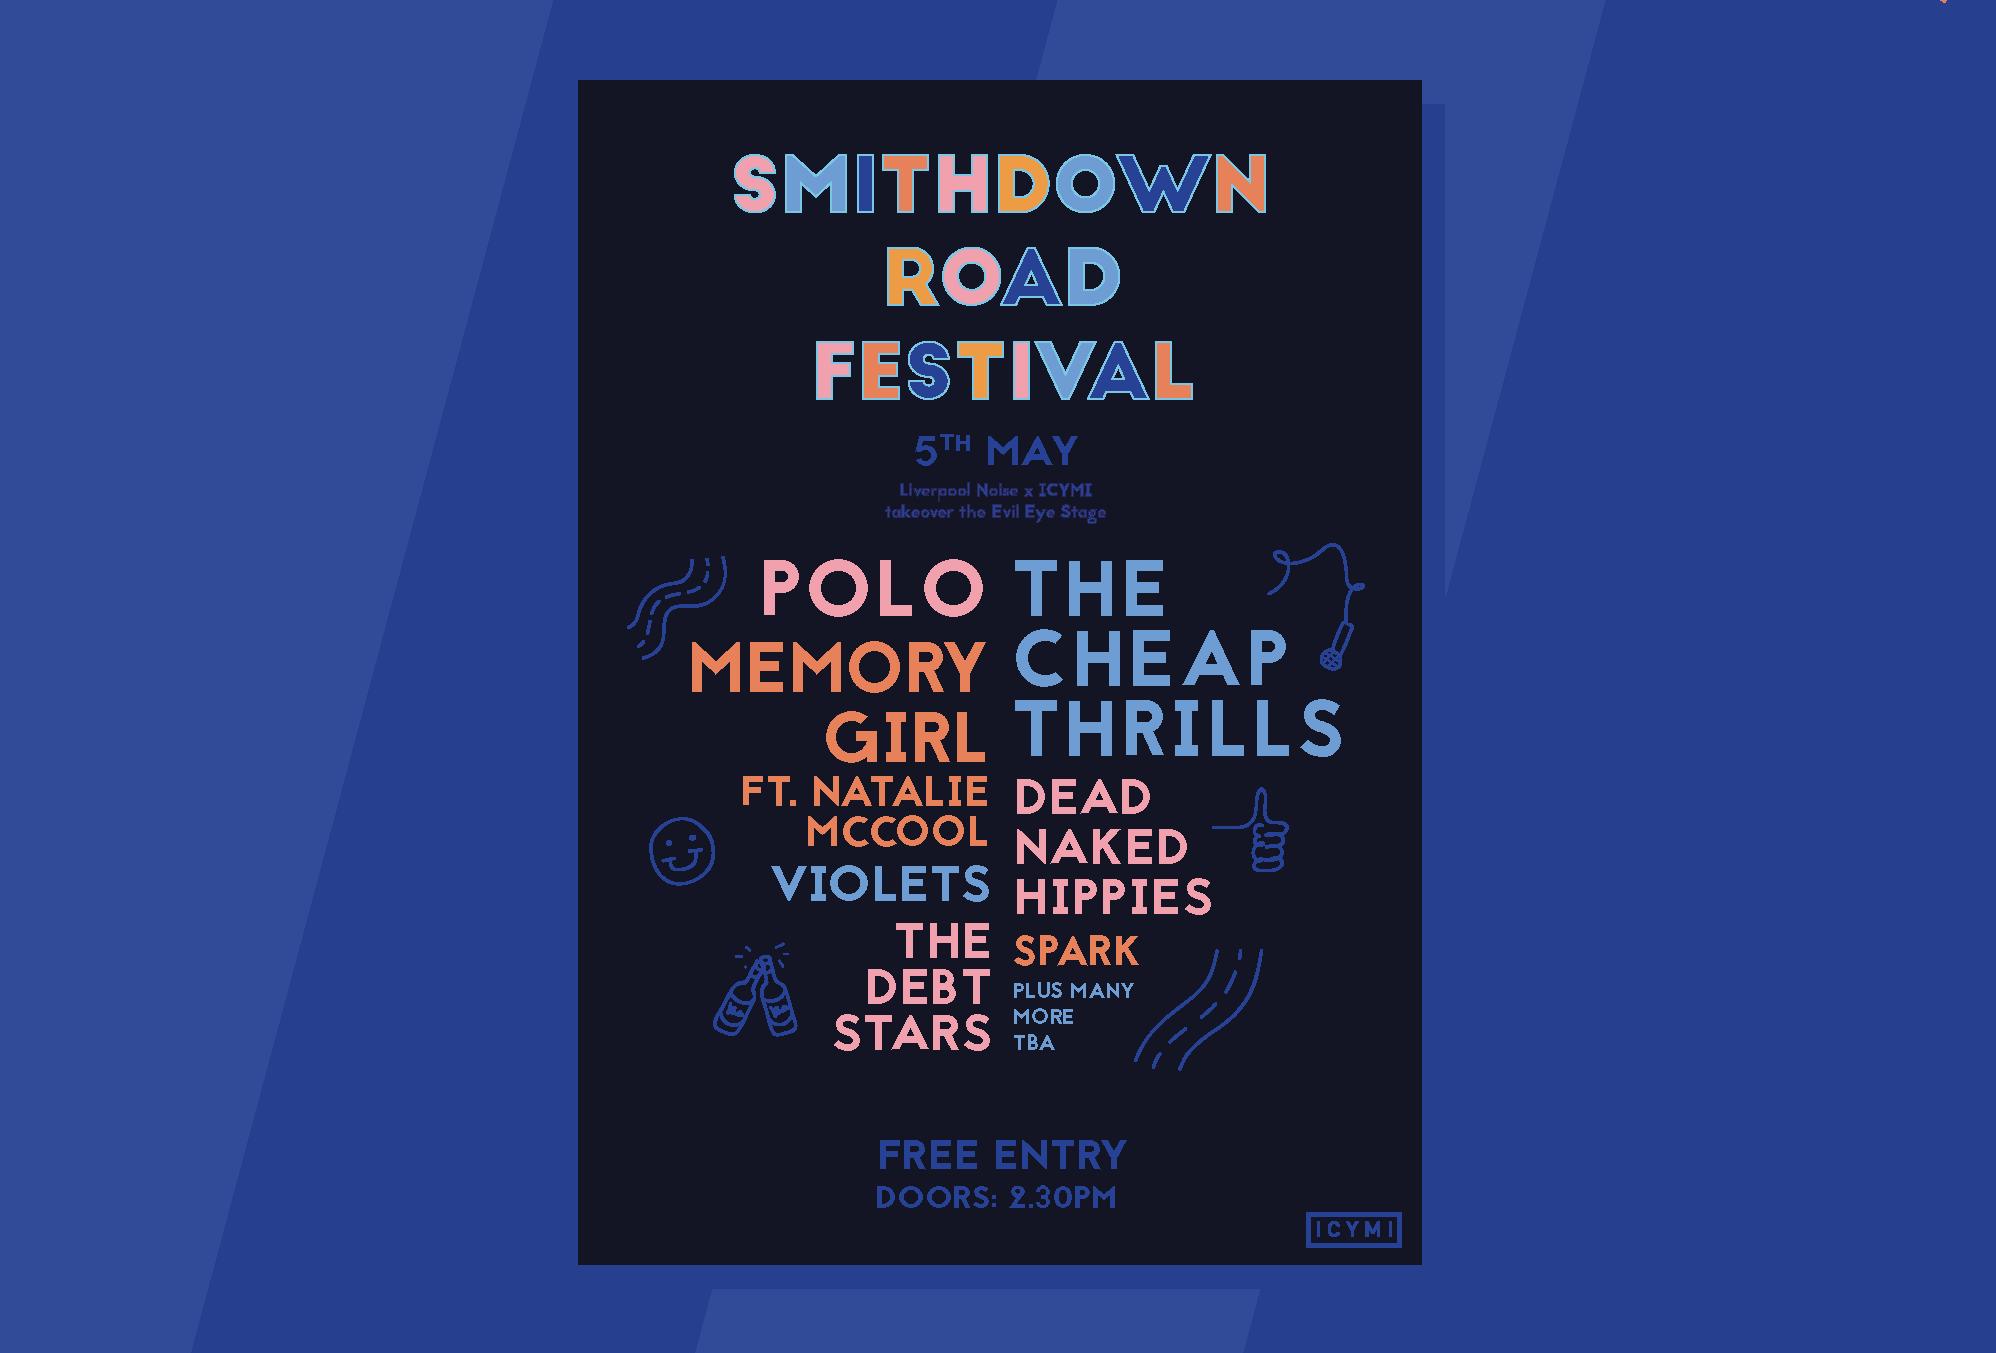 smithdown-poster-website.png